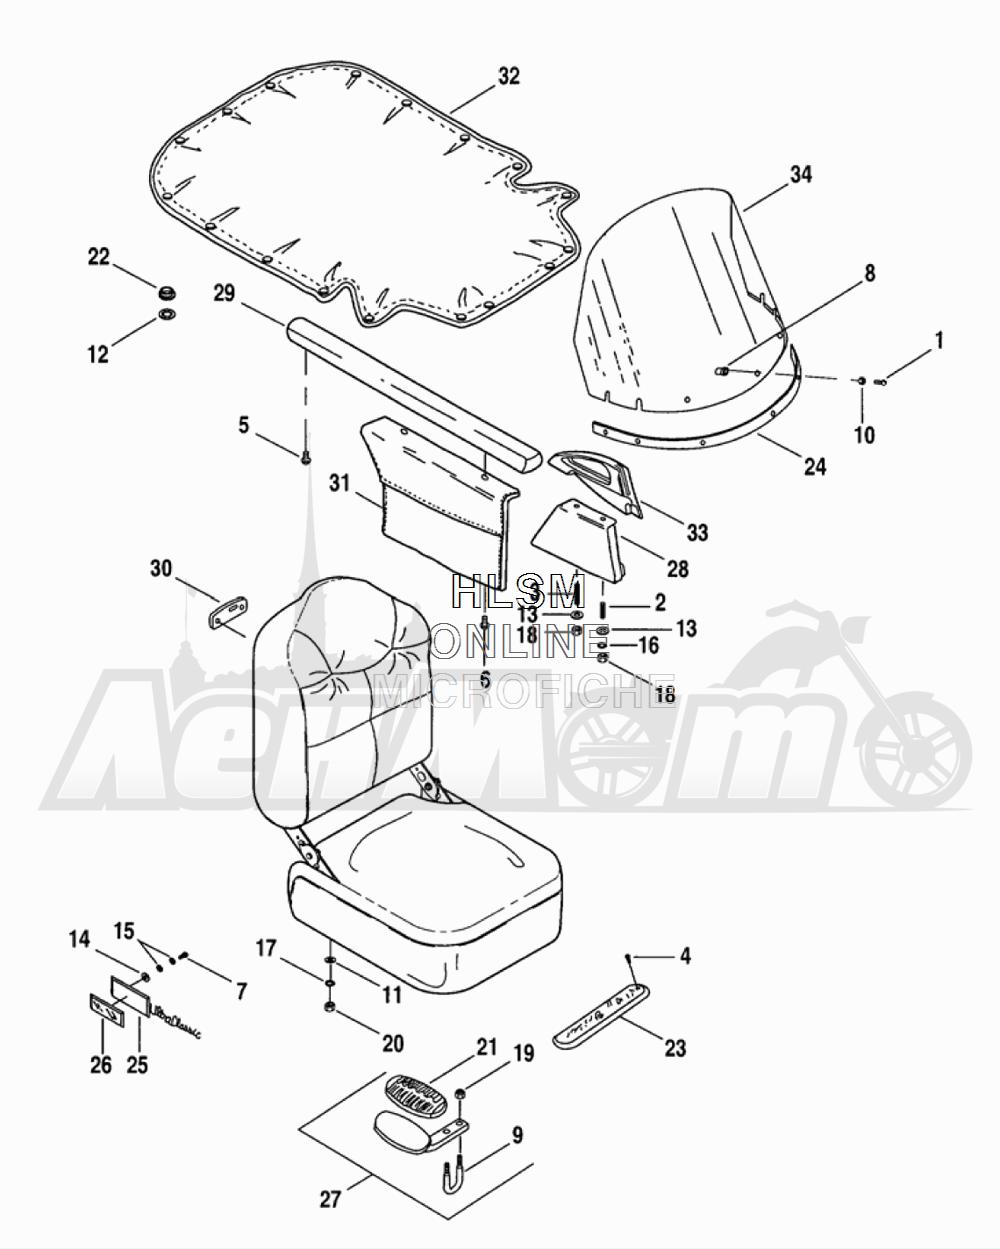 Запчасти для Мотоцикла Harley-Davidson 2005 TLE - SIDE CAR Раздел: SEAT AND WINDSHIELD ASSEMPLY | сиденье и ветровое стекло ASSEMPLY